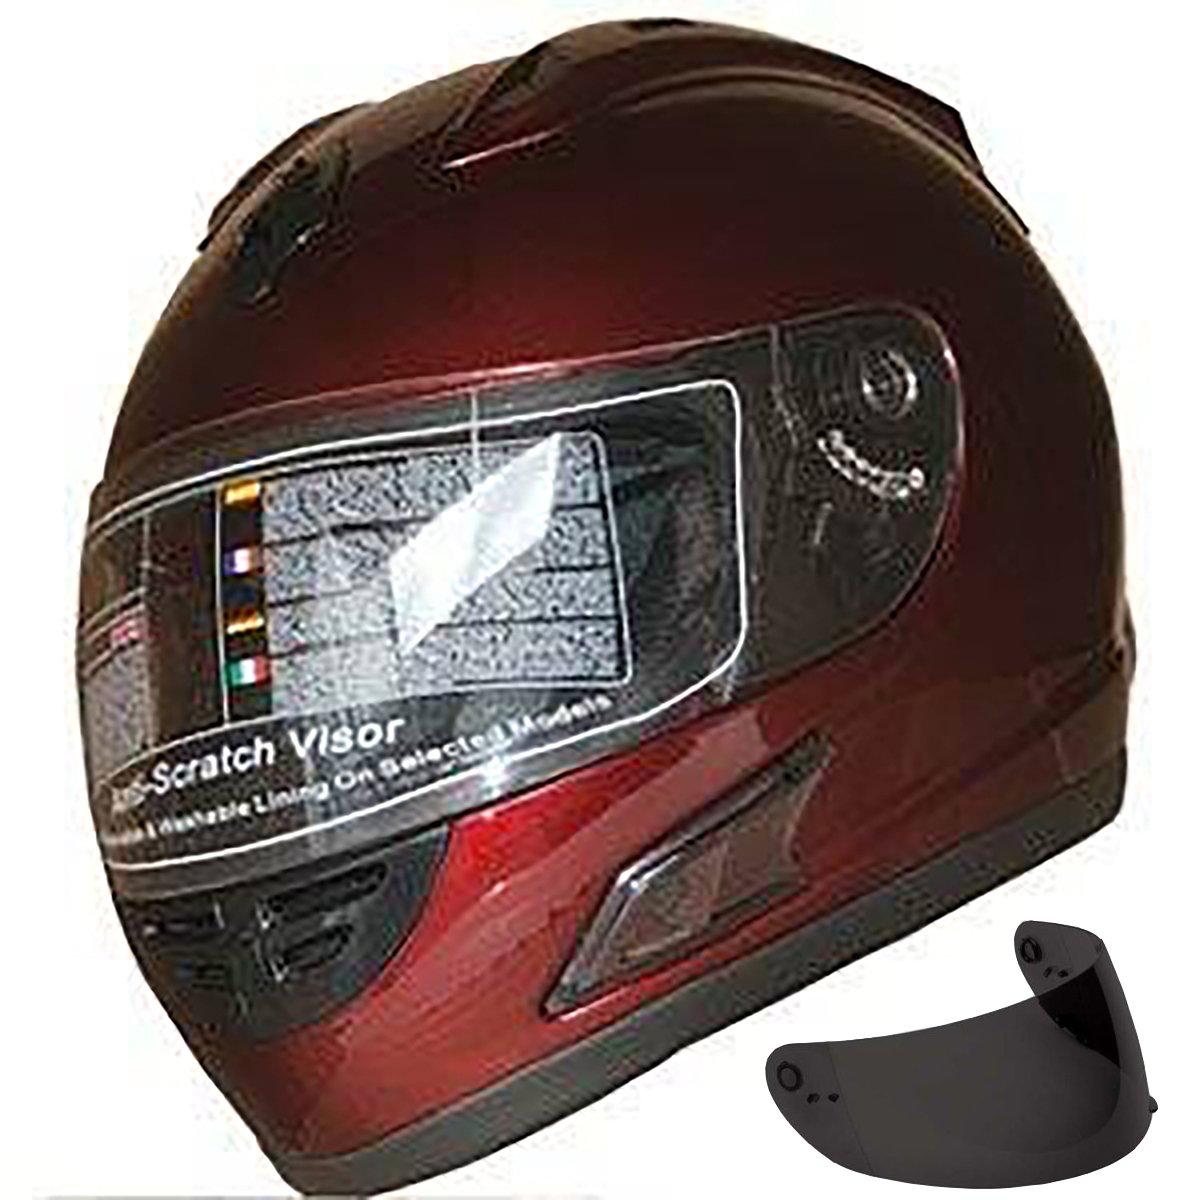 Motorcycle Street Sport Bike Helmet Full Face Helmet FF10 2 Visors Comes with Clear Shield and Free Dark Tinted Shield (Burgundy, L)